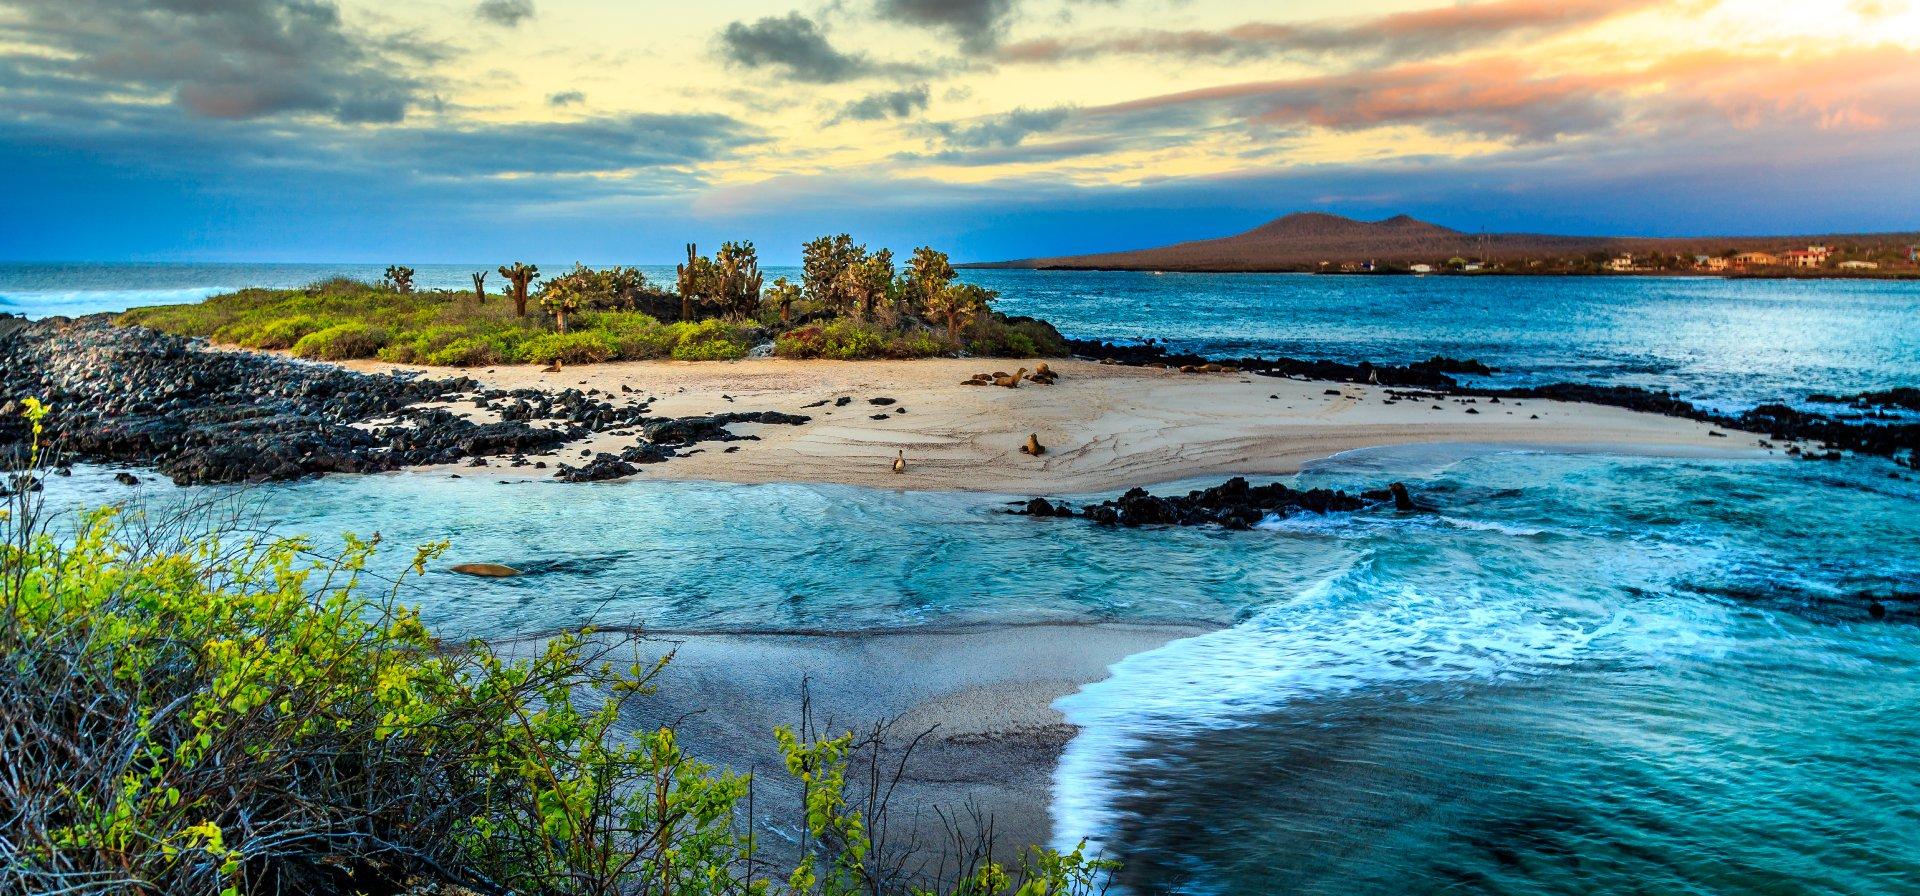 Shutterstock Galapagos